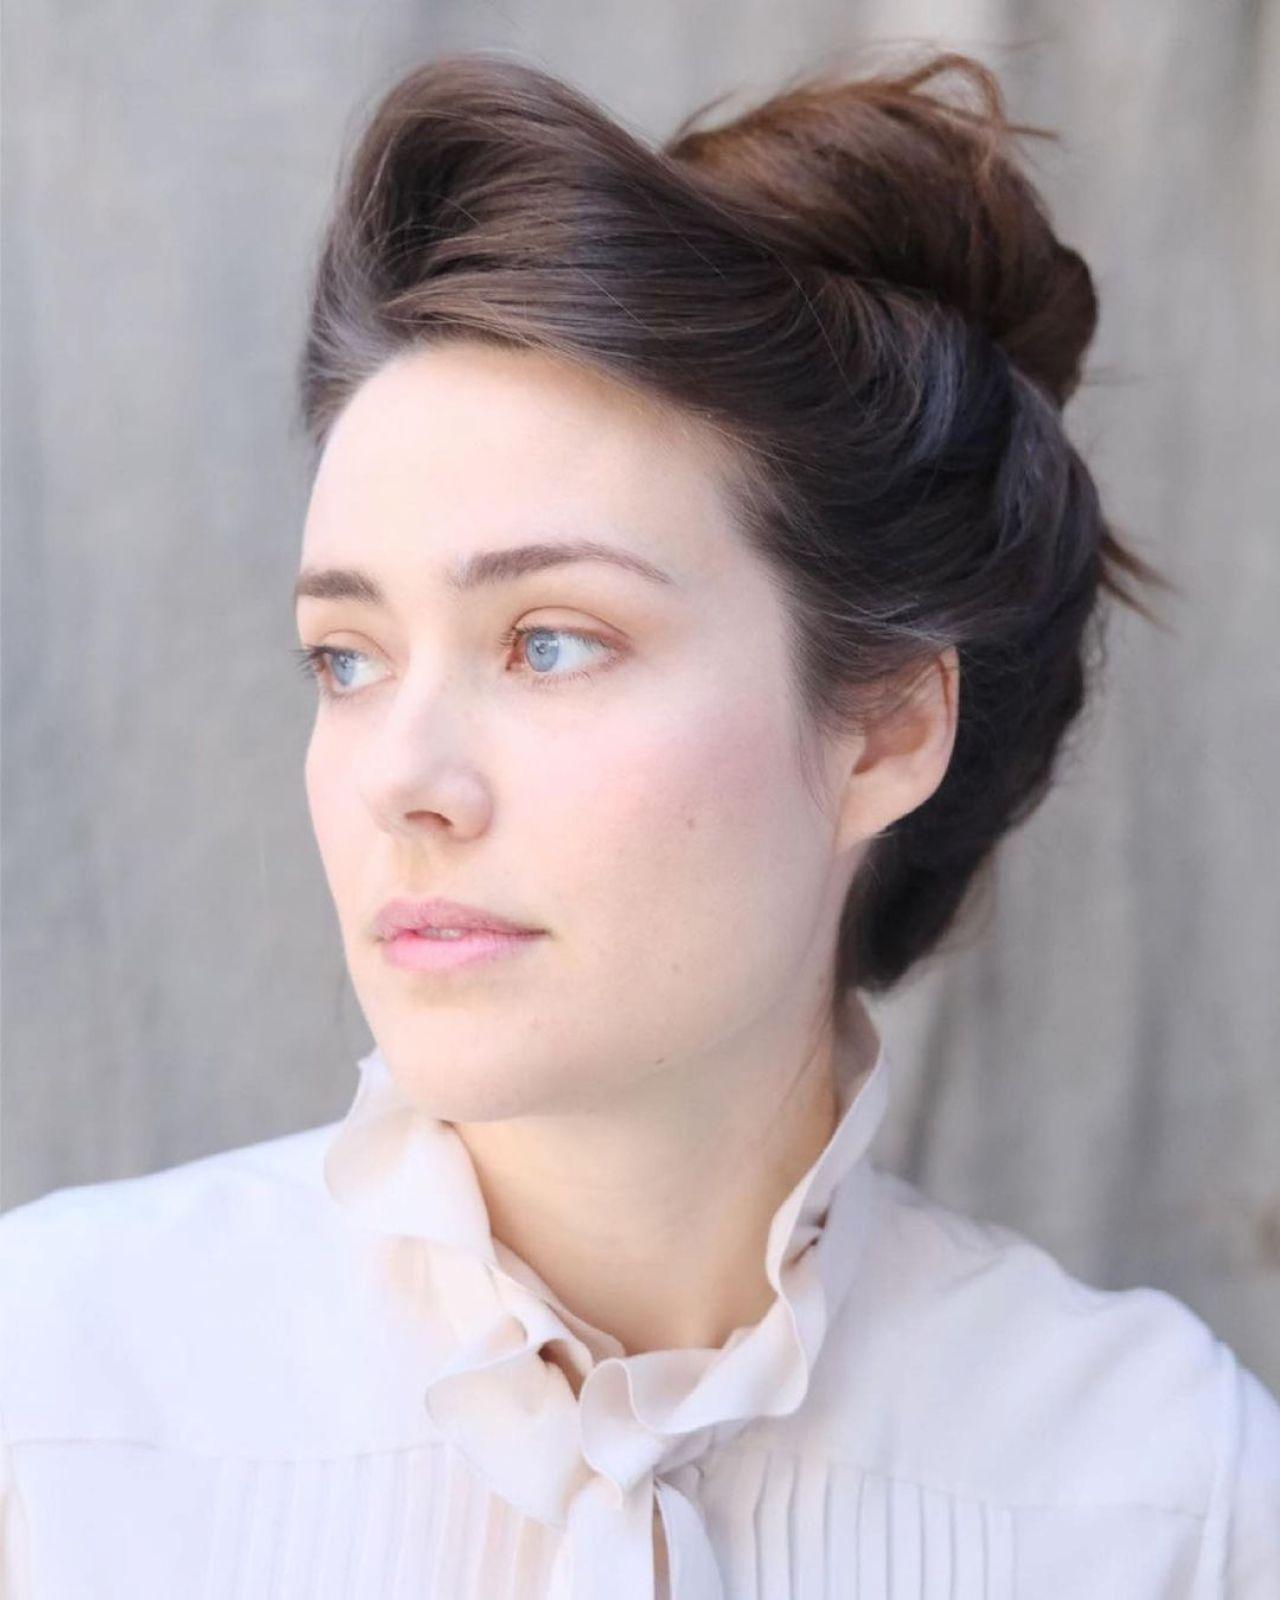 Megan boon